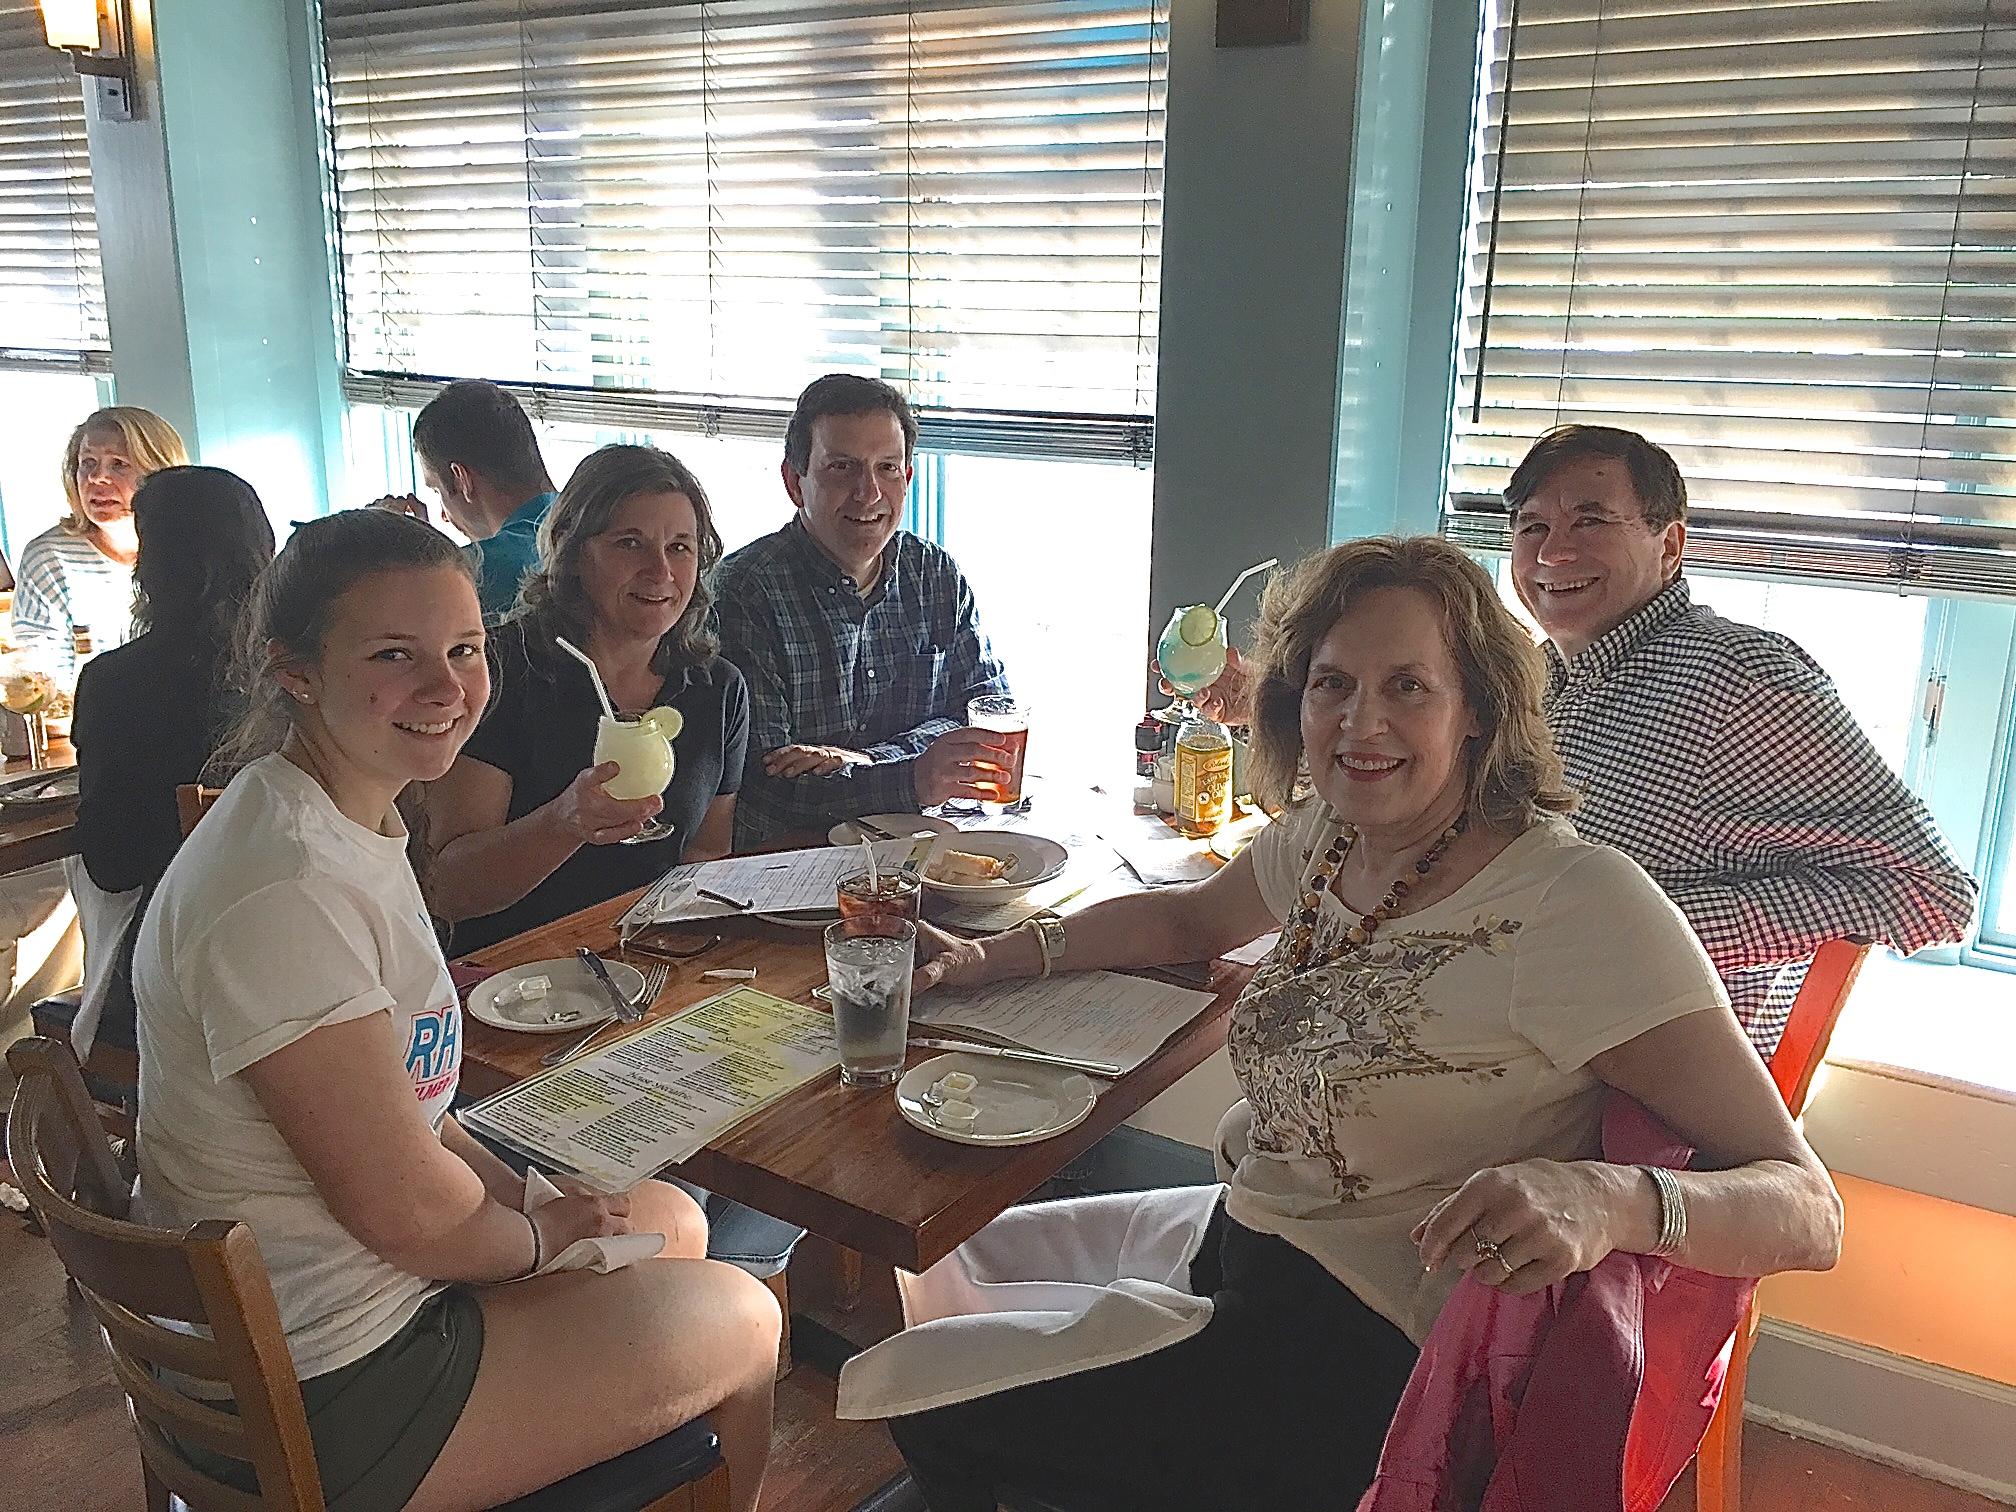 Skaneateles, NY 5-28-17  Sara, Cyndi & Nick Signorelli, John & Lorraine Gudas at the Blue Water Grill